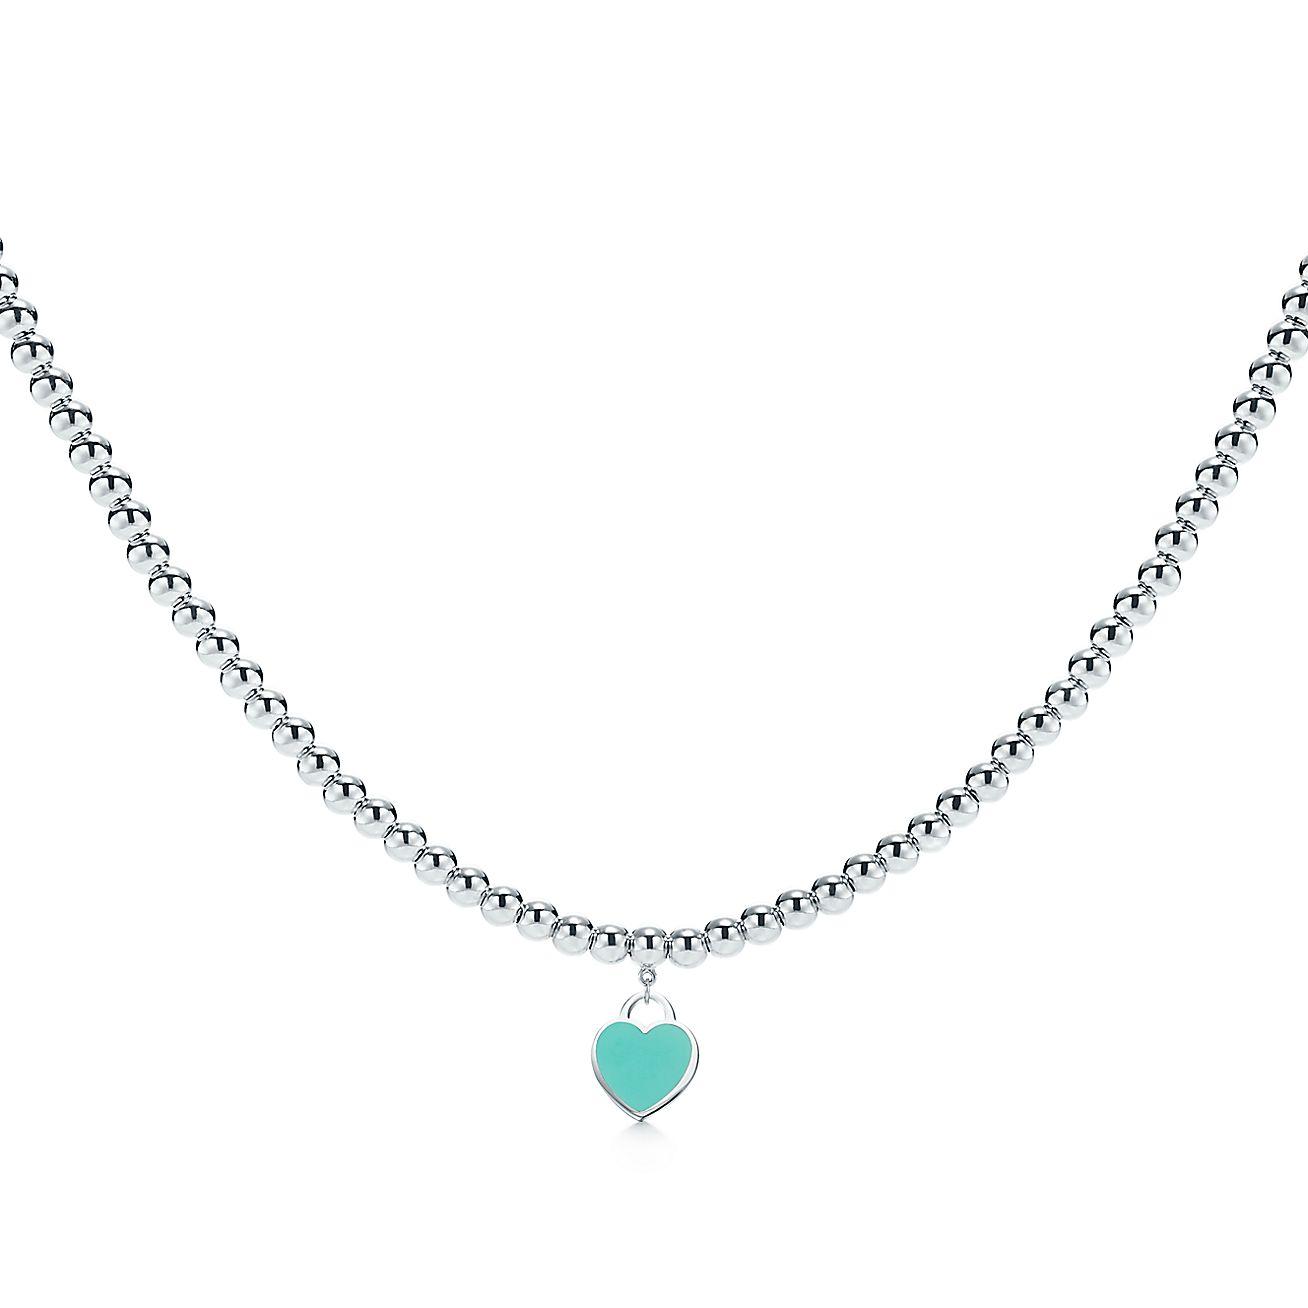 Return to tiffany heart tag necklace in sterling silver on a beaded return to tiffany heart tag necklace in sterling silver on a beaded necklace tiffany co aloadofball Gallery